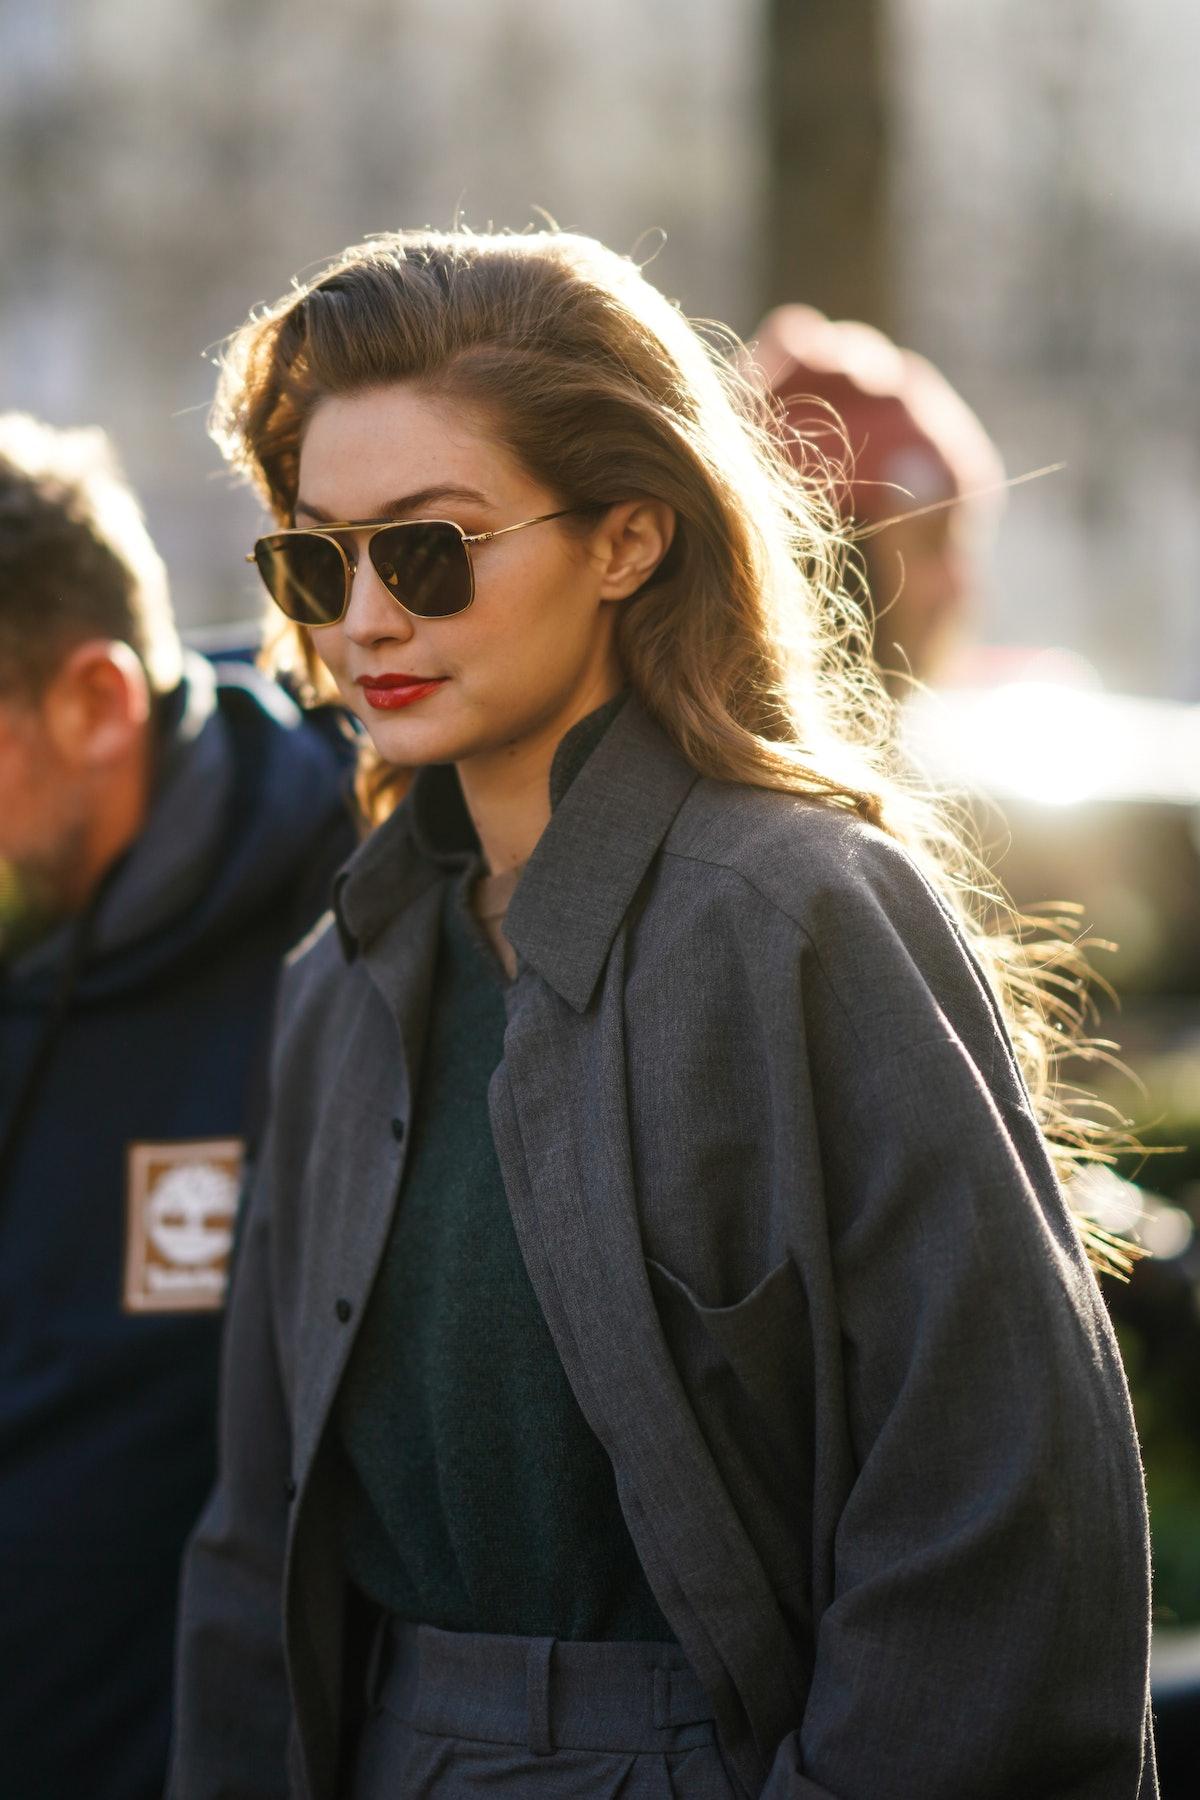 Gigi Hadid hits the streets in a gray blazer and aviator sunglasses.